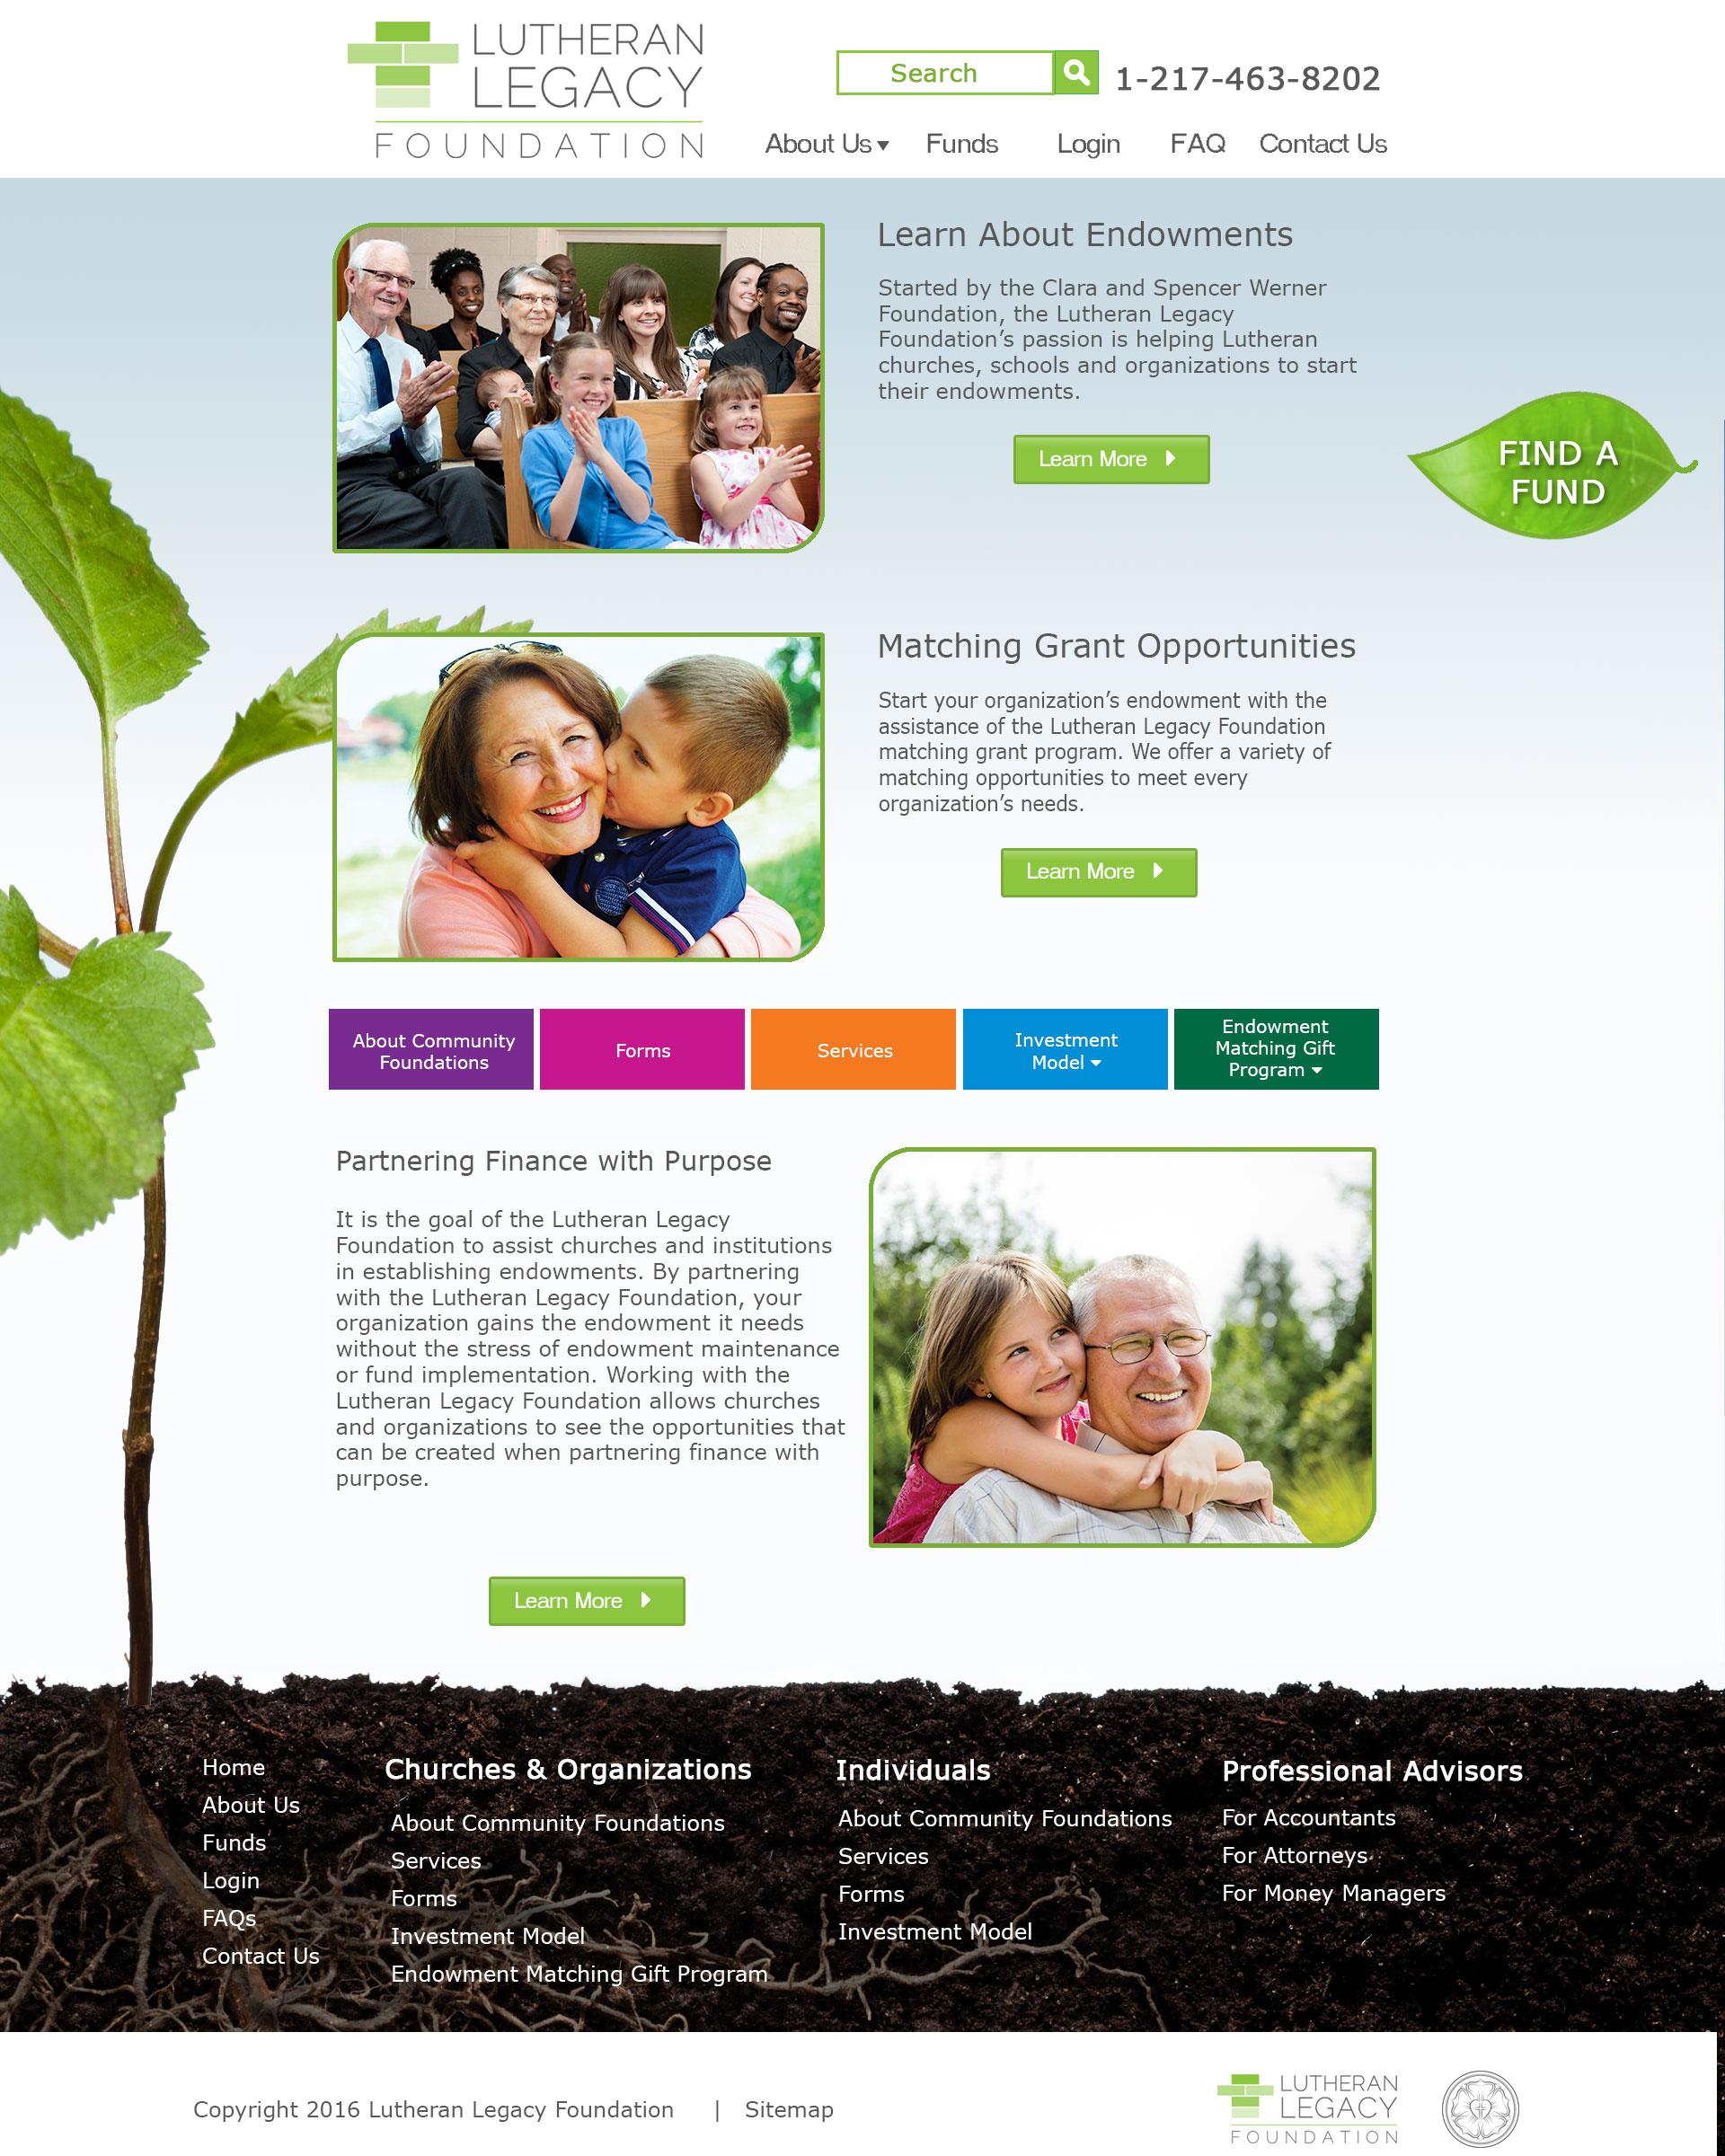 Lutheran Legacy Foundation Organizations Page